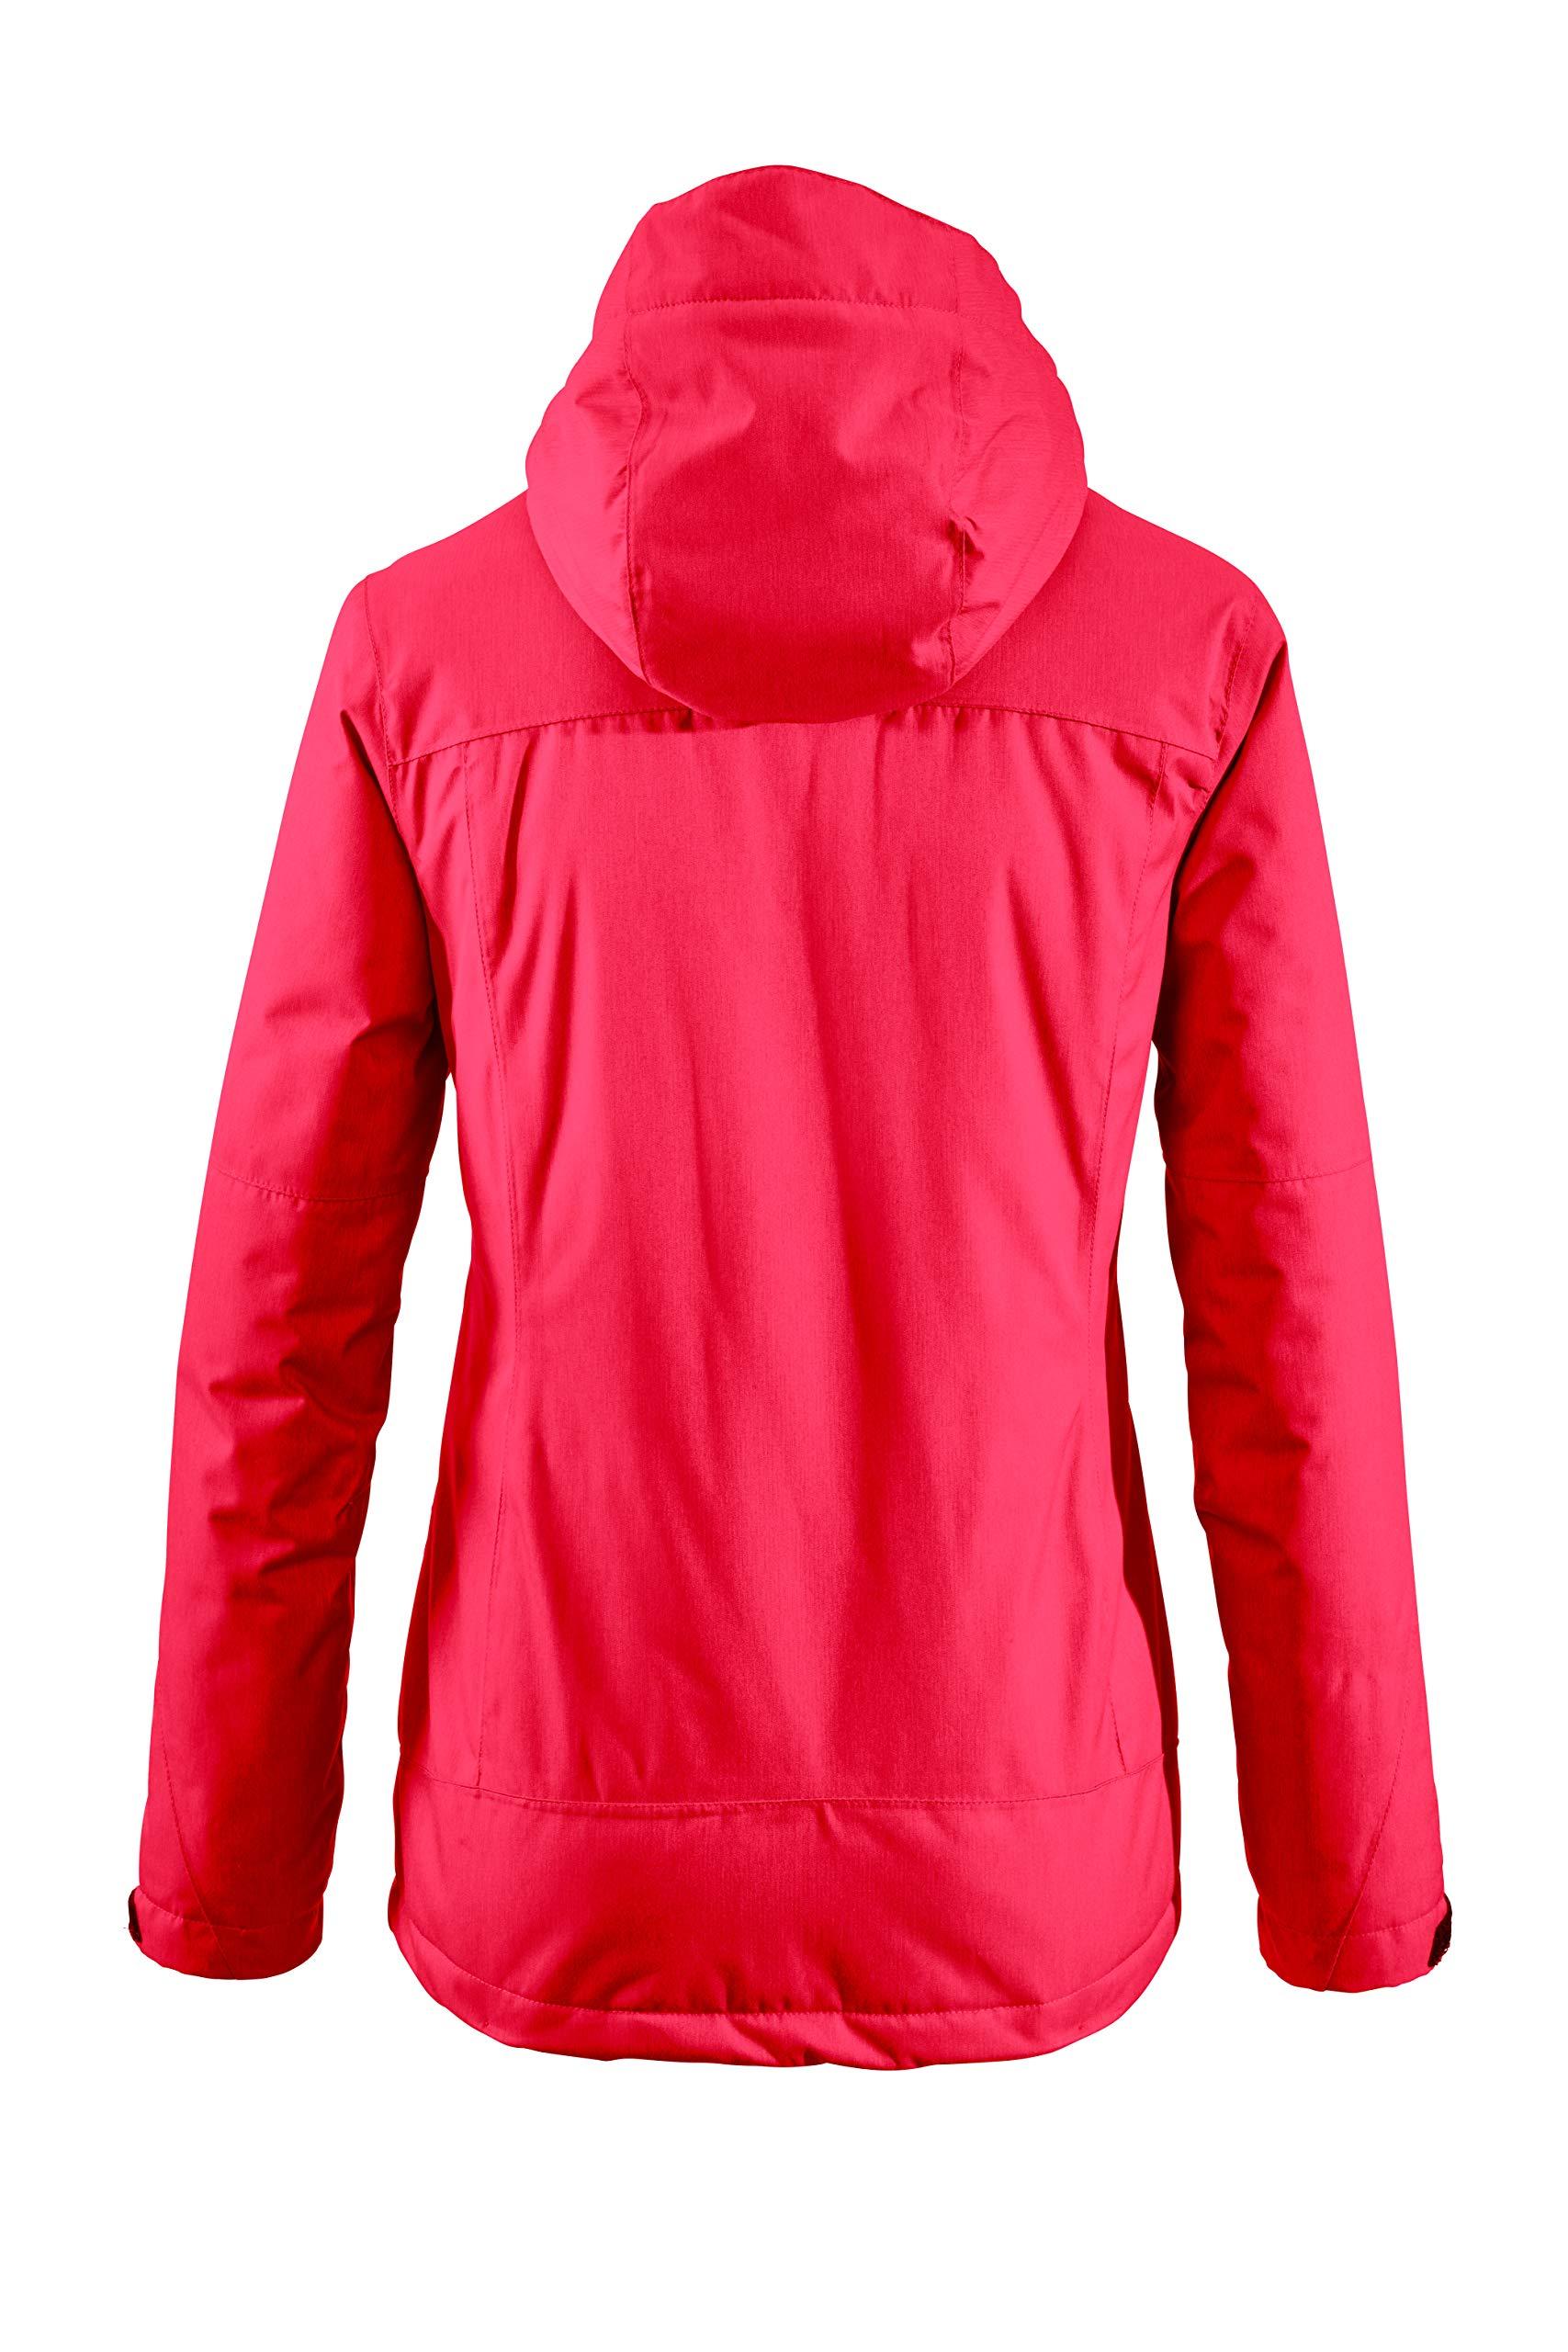 81wITNkgfgL - killtec Women's Zala Functional Jacket with Zip-Off Hood